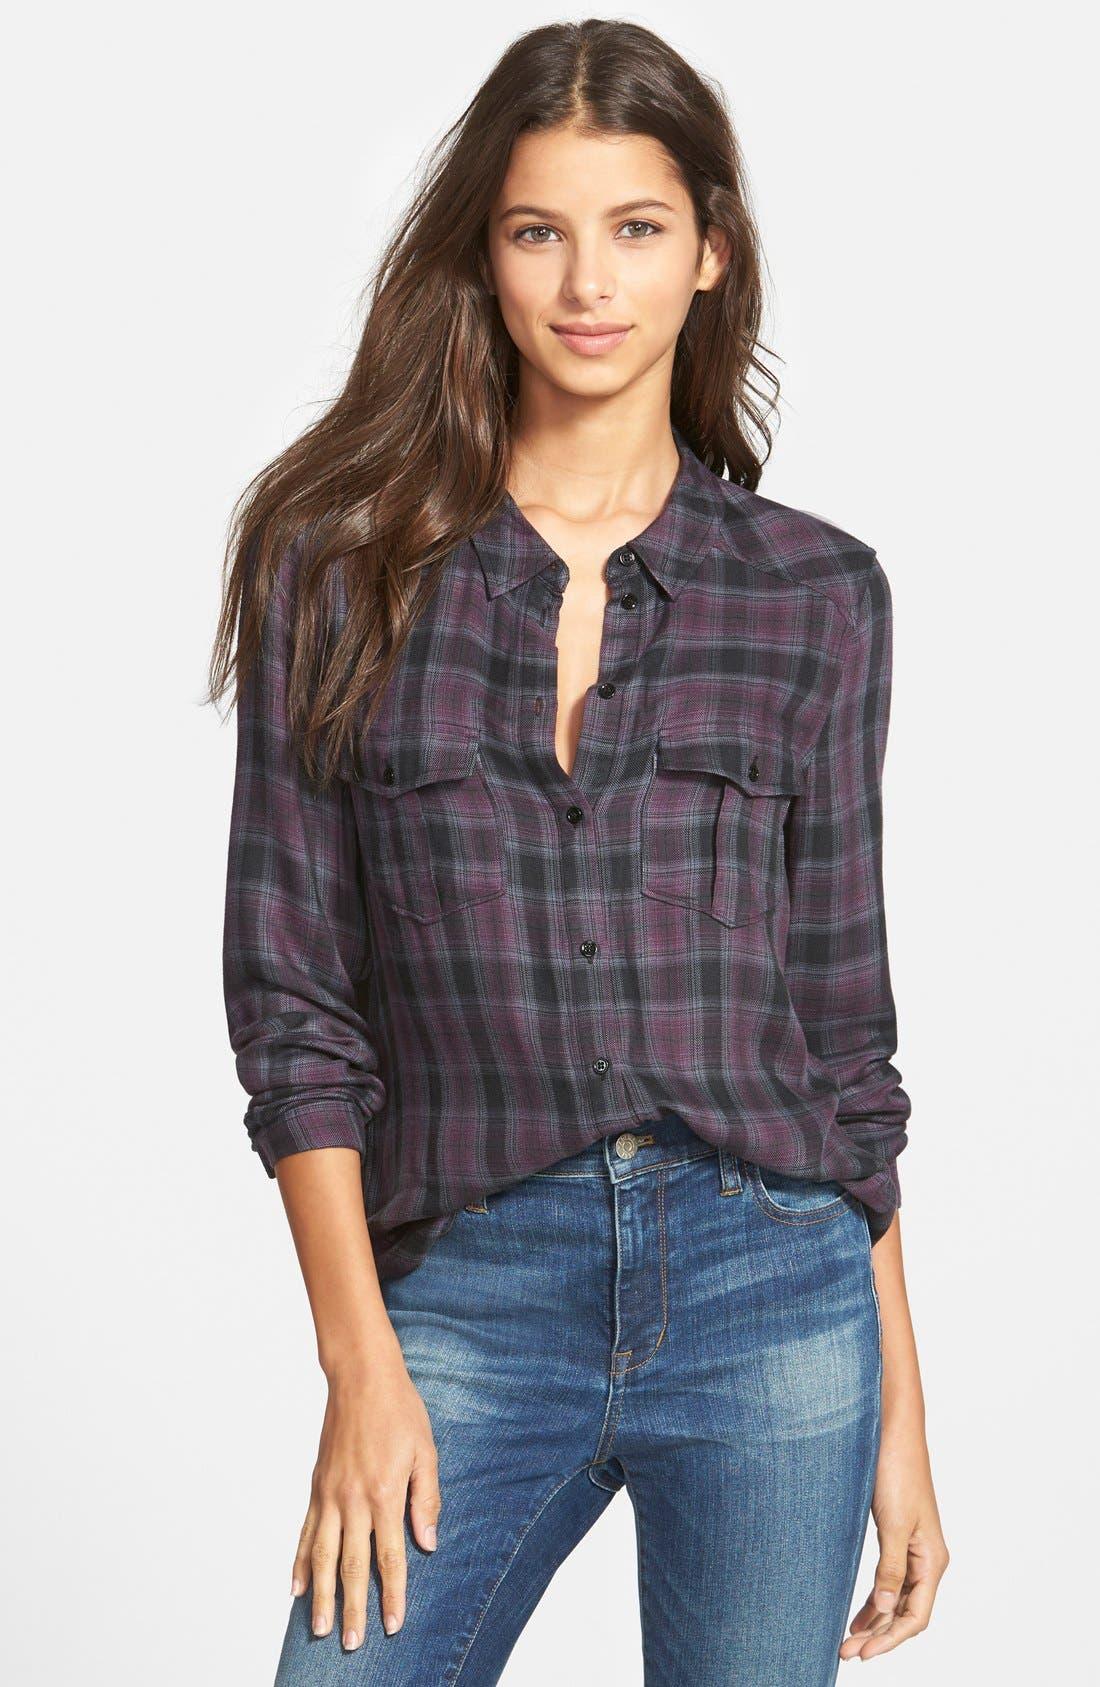 Alternate Image 1 Selected - Paige Denim 'Mya' Plaid Shirt